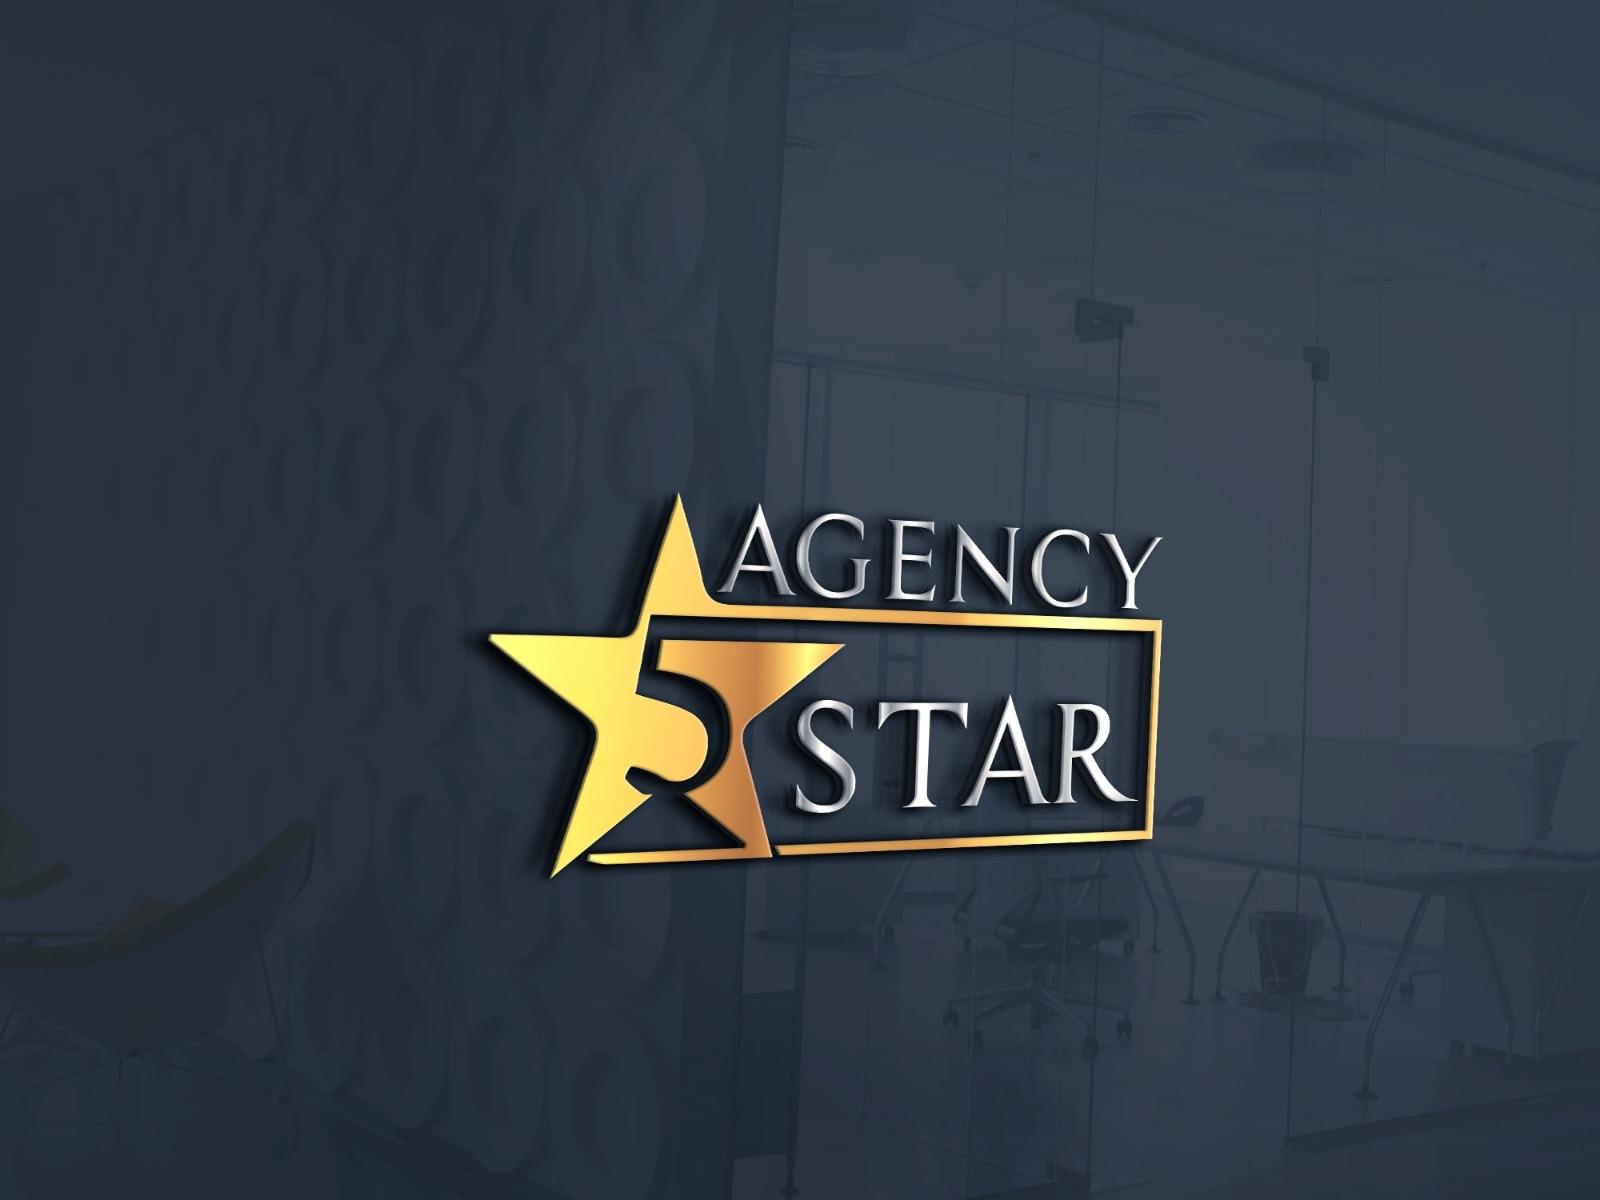 Elite Escort Agency Agency5stars in Istanbul